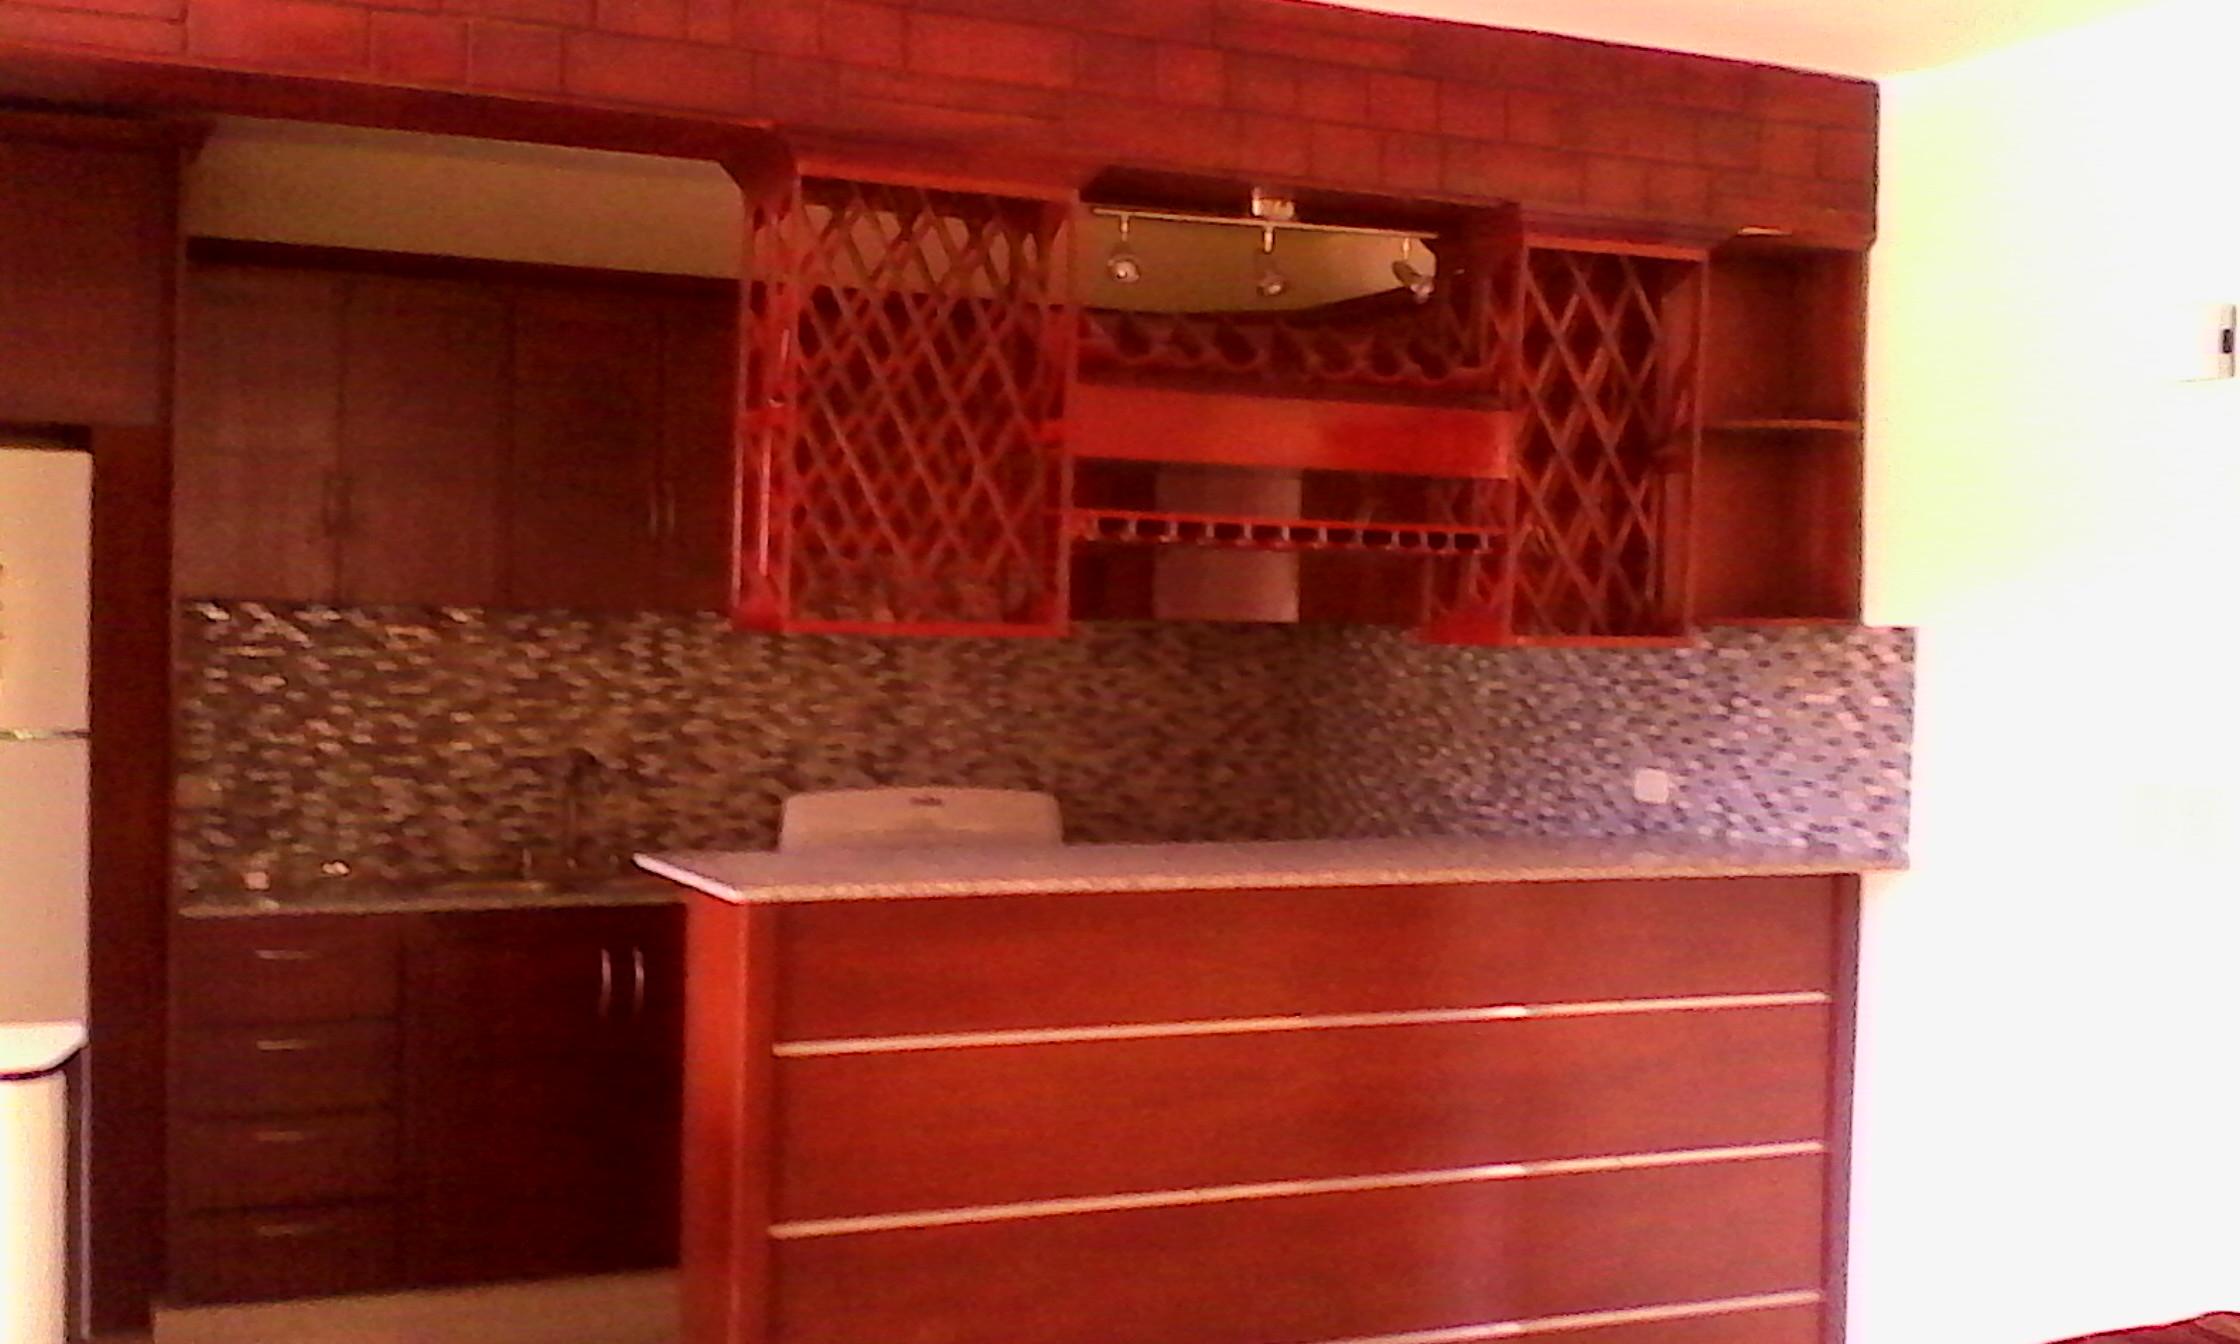 Appartements non meubles a louer delmas 31 - Appartement a louer meuble ...